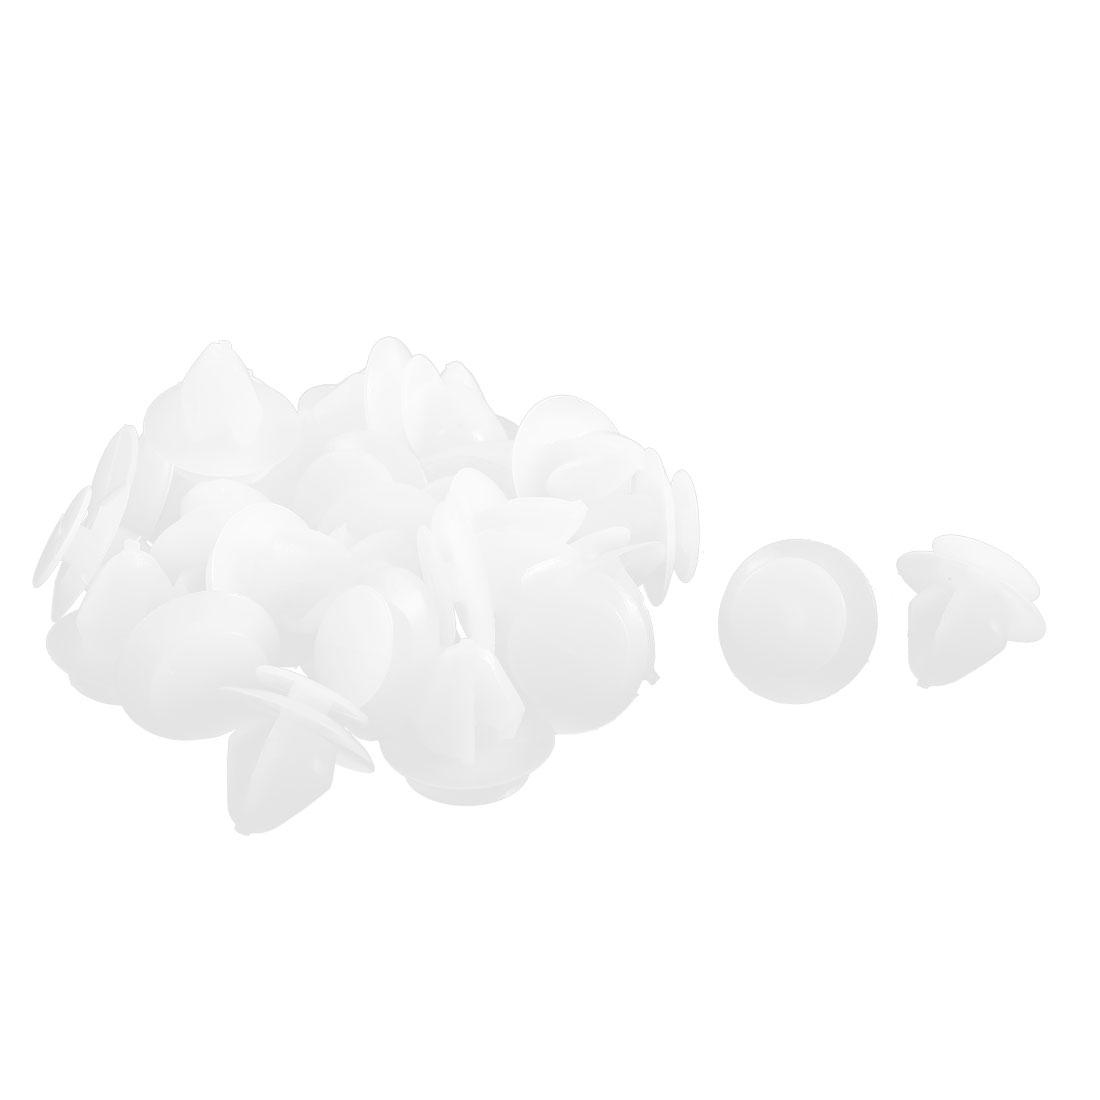 30 Pcs White Plastic Splash Guard Fastener Rivet Clips 11mm x 12mm x 17mm